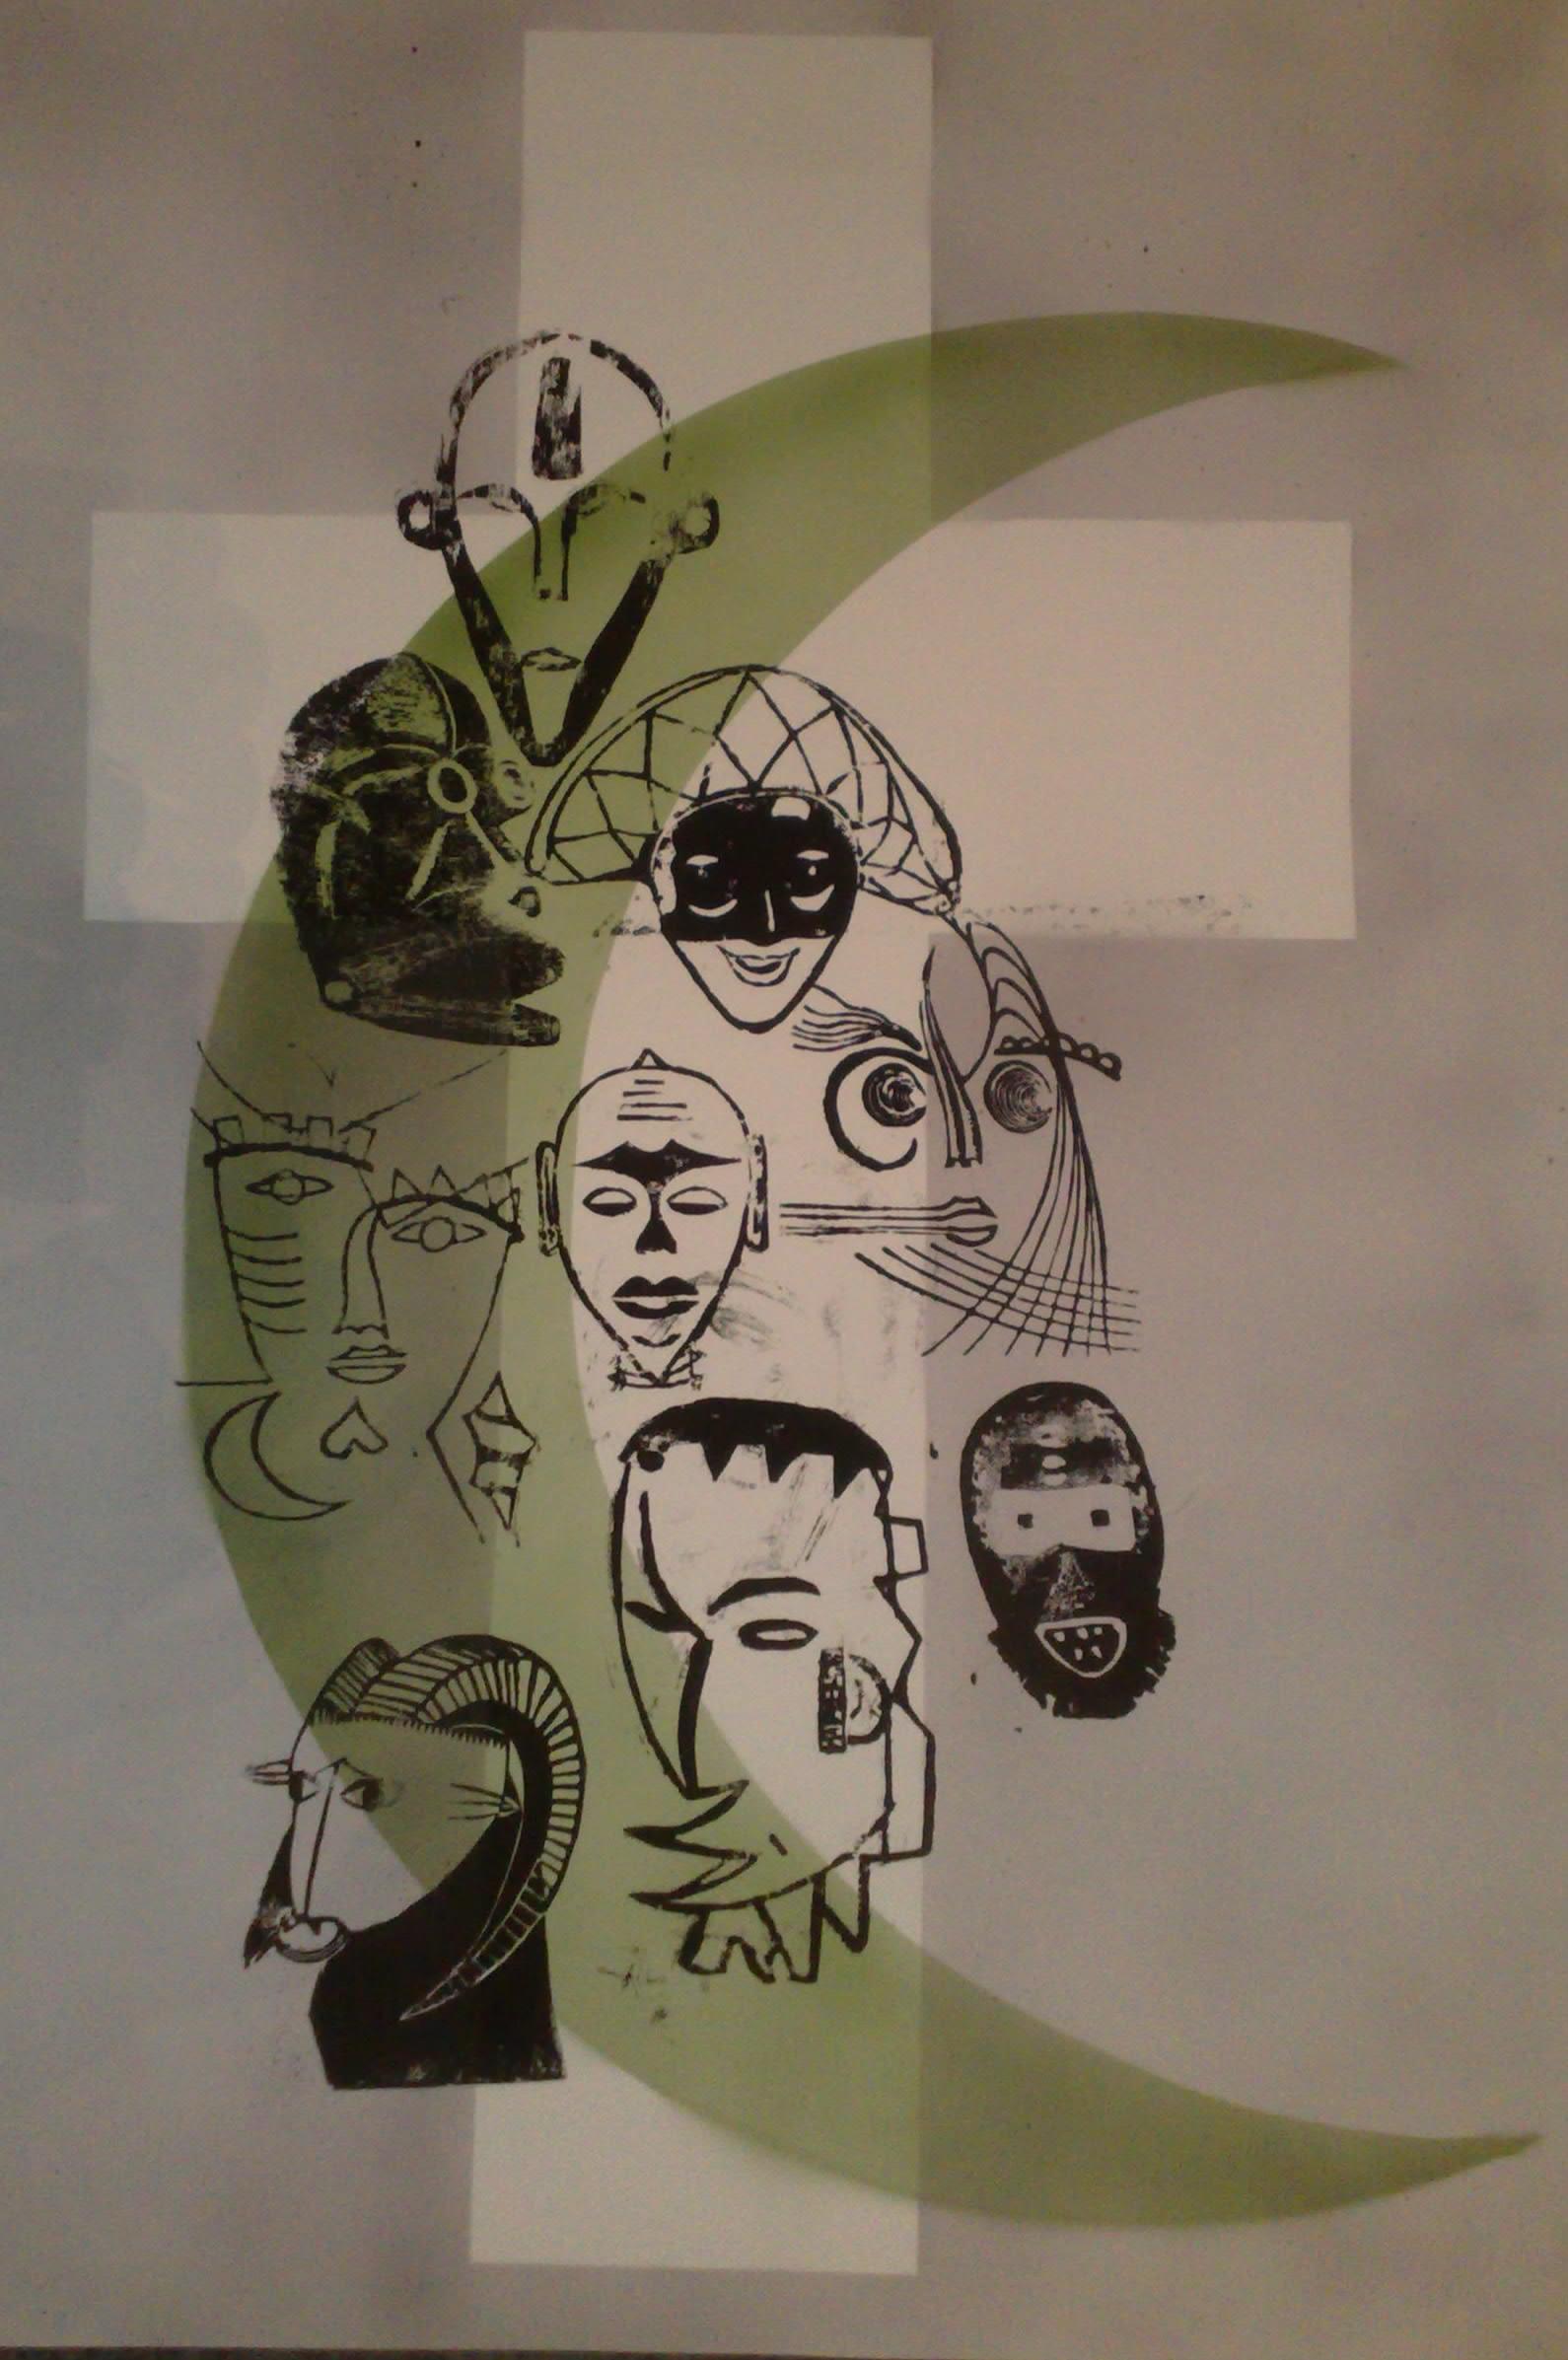 Aberglaube: Christentum, Islam & Co. 1 - Holzschnitt und Linolschnitt - Mischtechnik